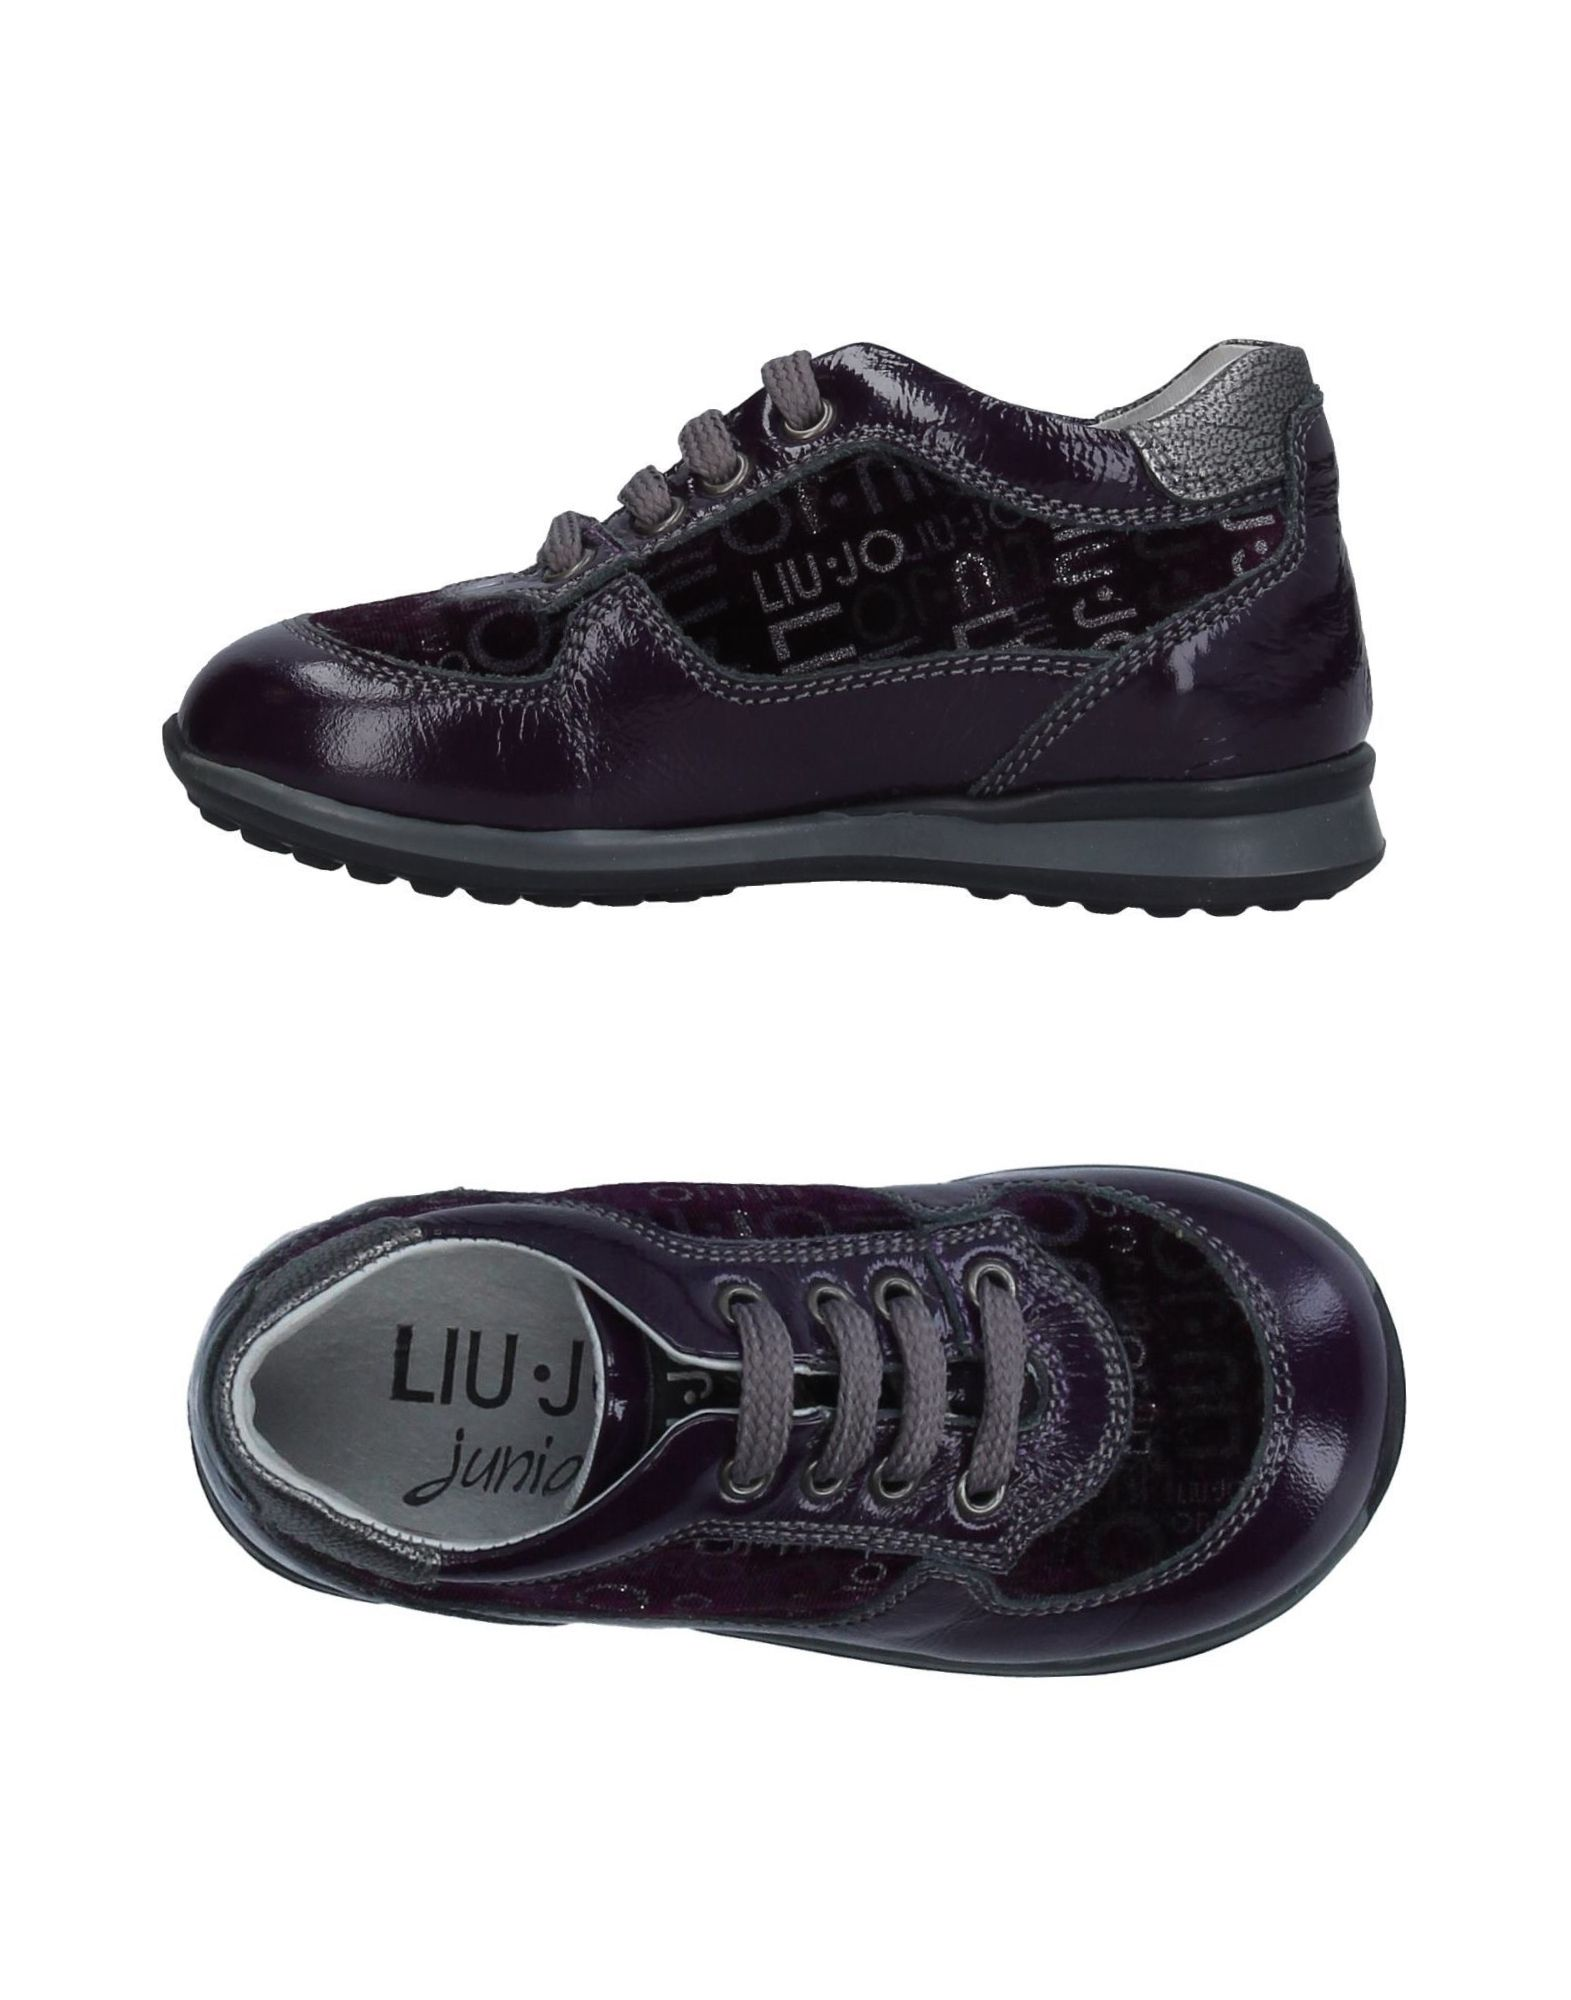 LIU •JO JUNIOR Mädchen 0-24 monate Low Sneakers & Tennisschuhe Farbe Violett Größe 40